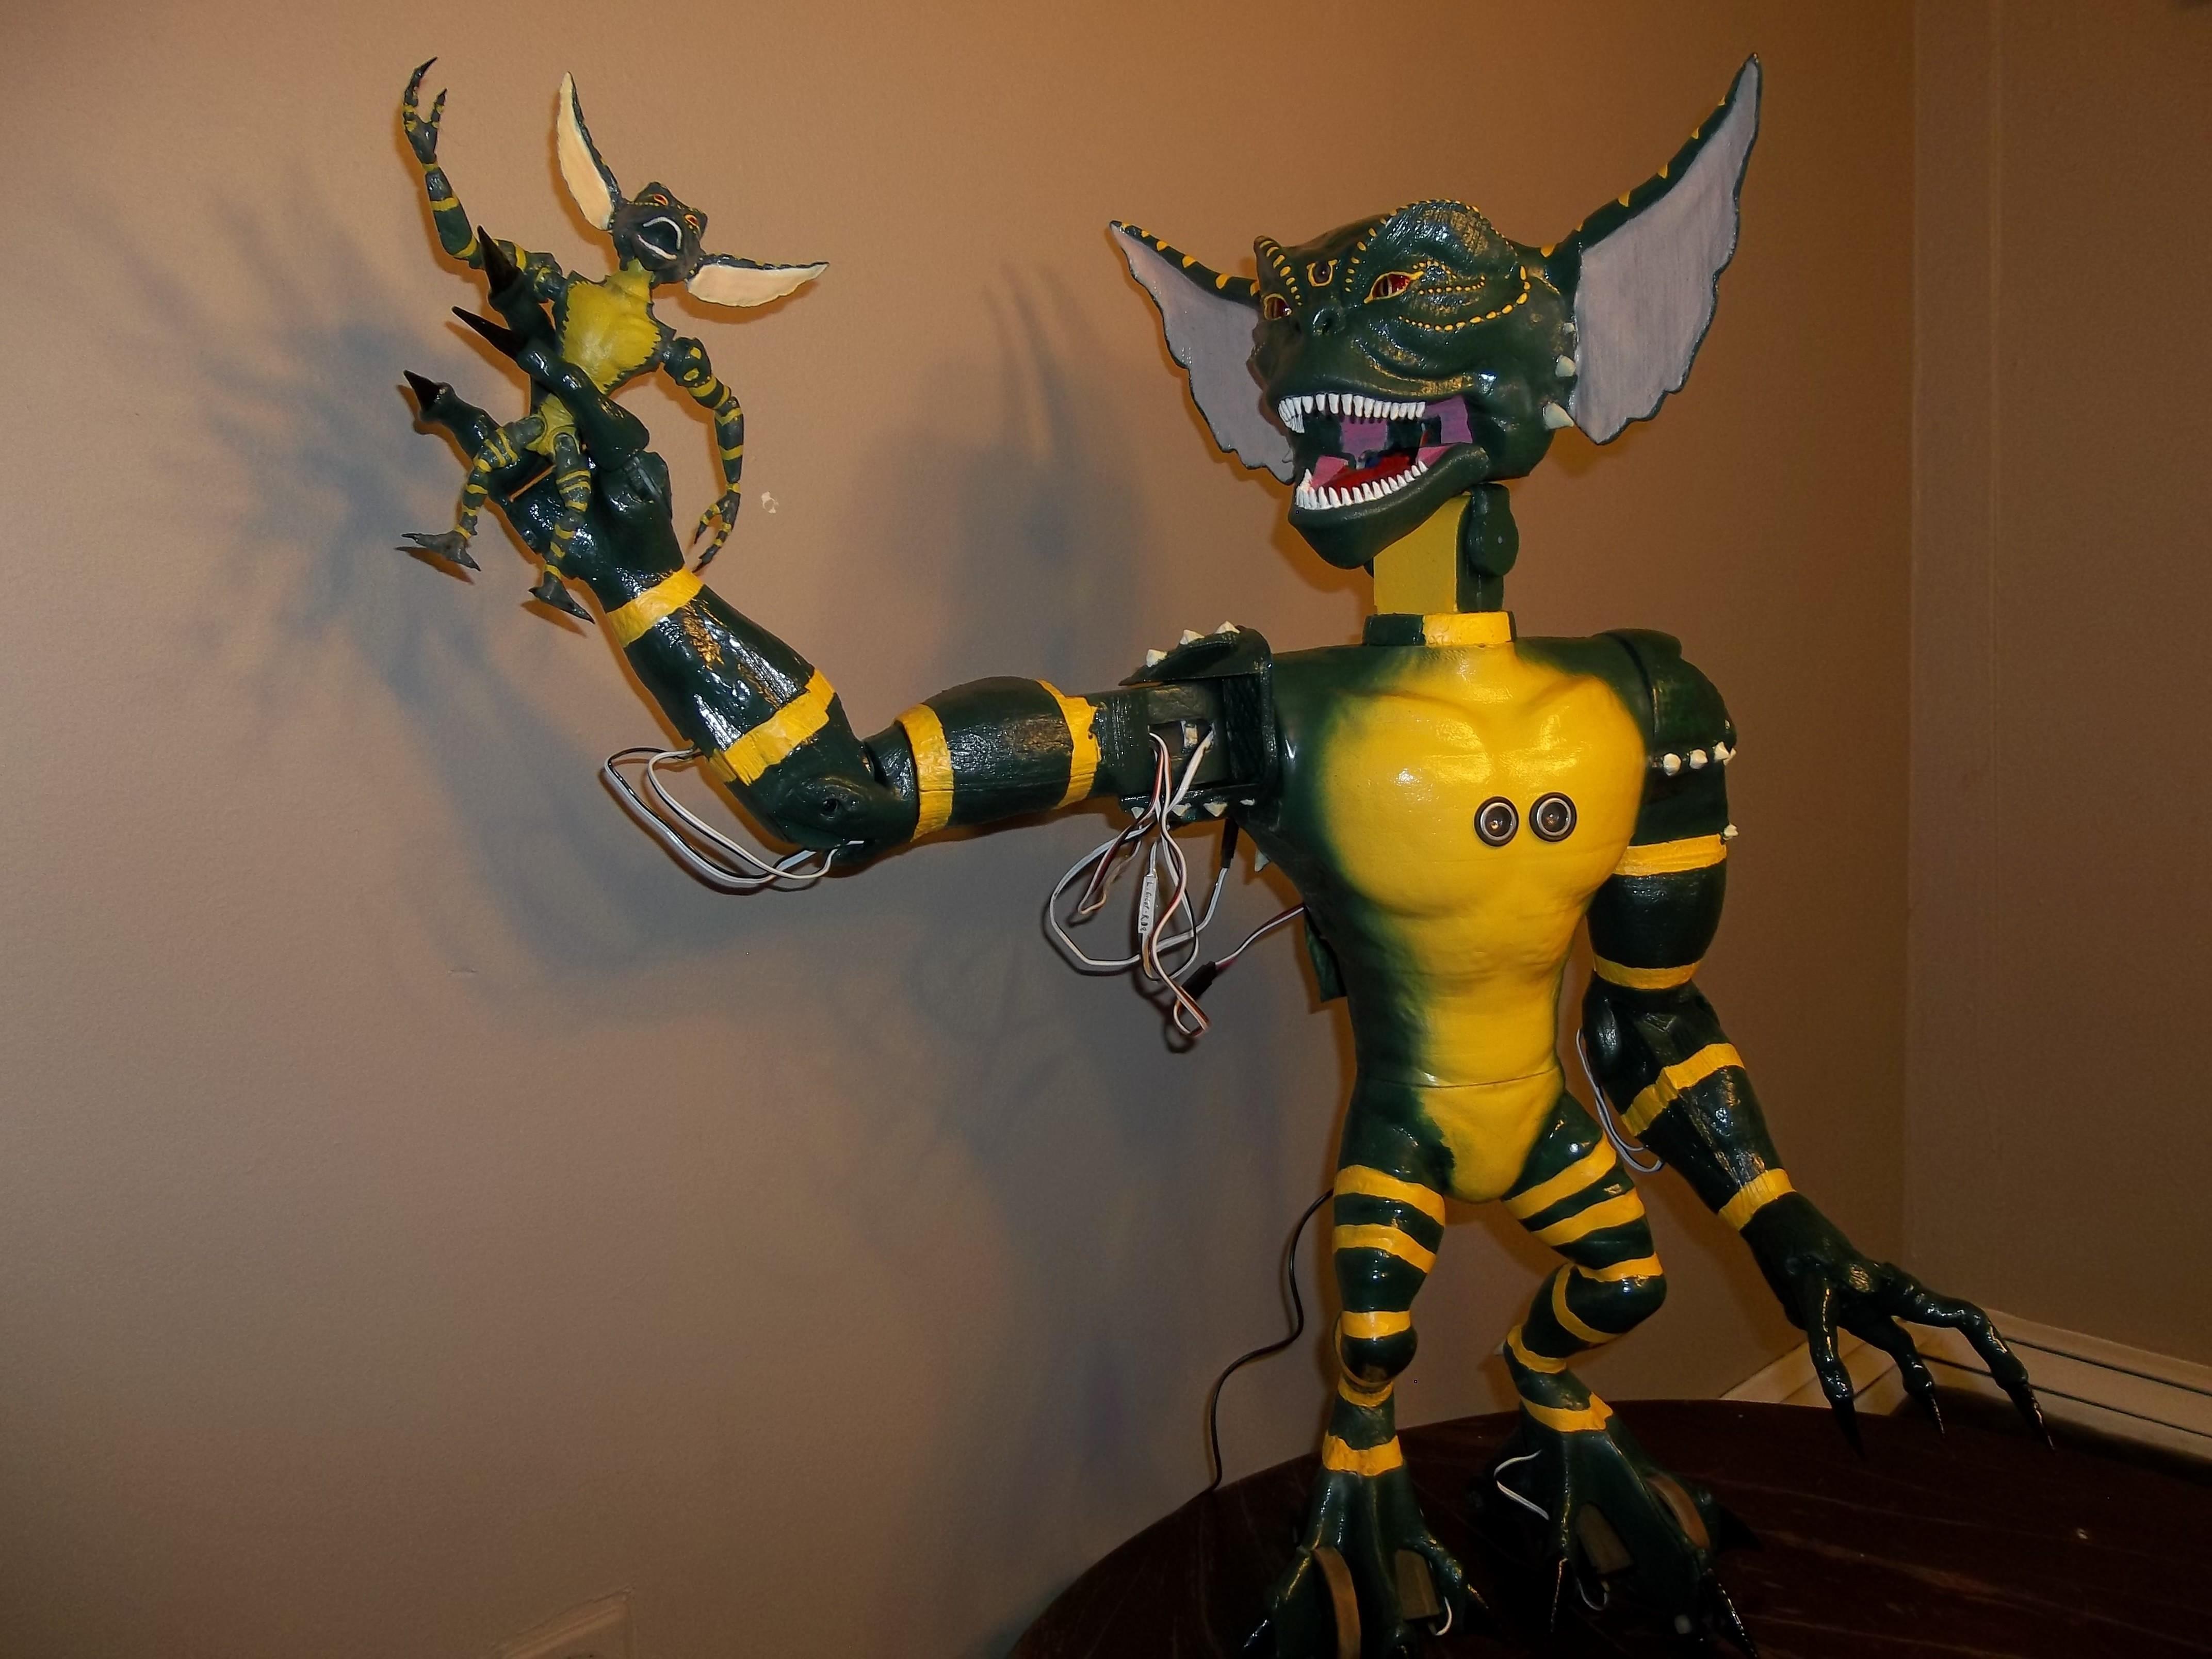 100_2452.JPG Download free STL file GADGET the robotic Gremlin • 3D printing object, atarka3